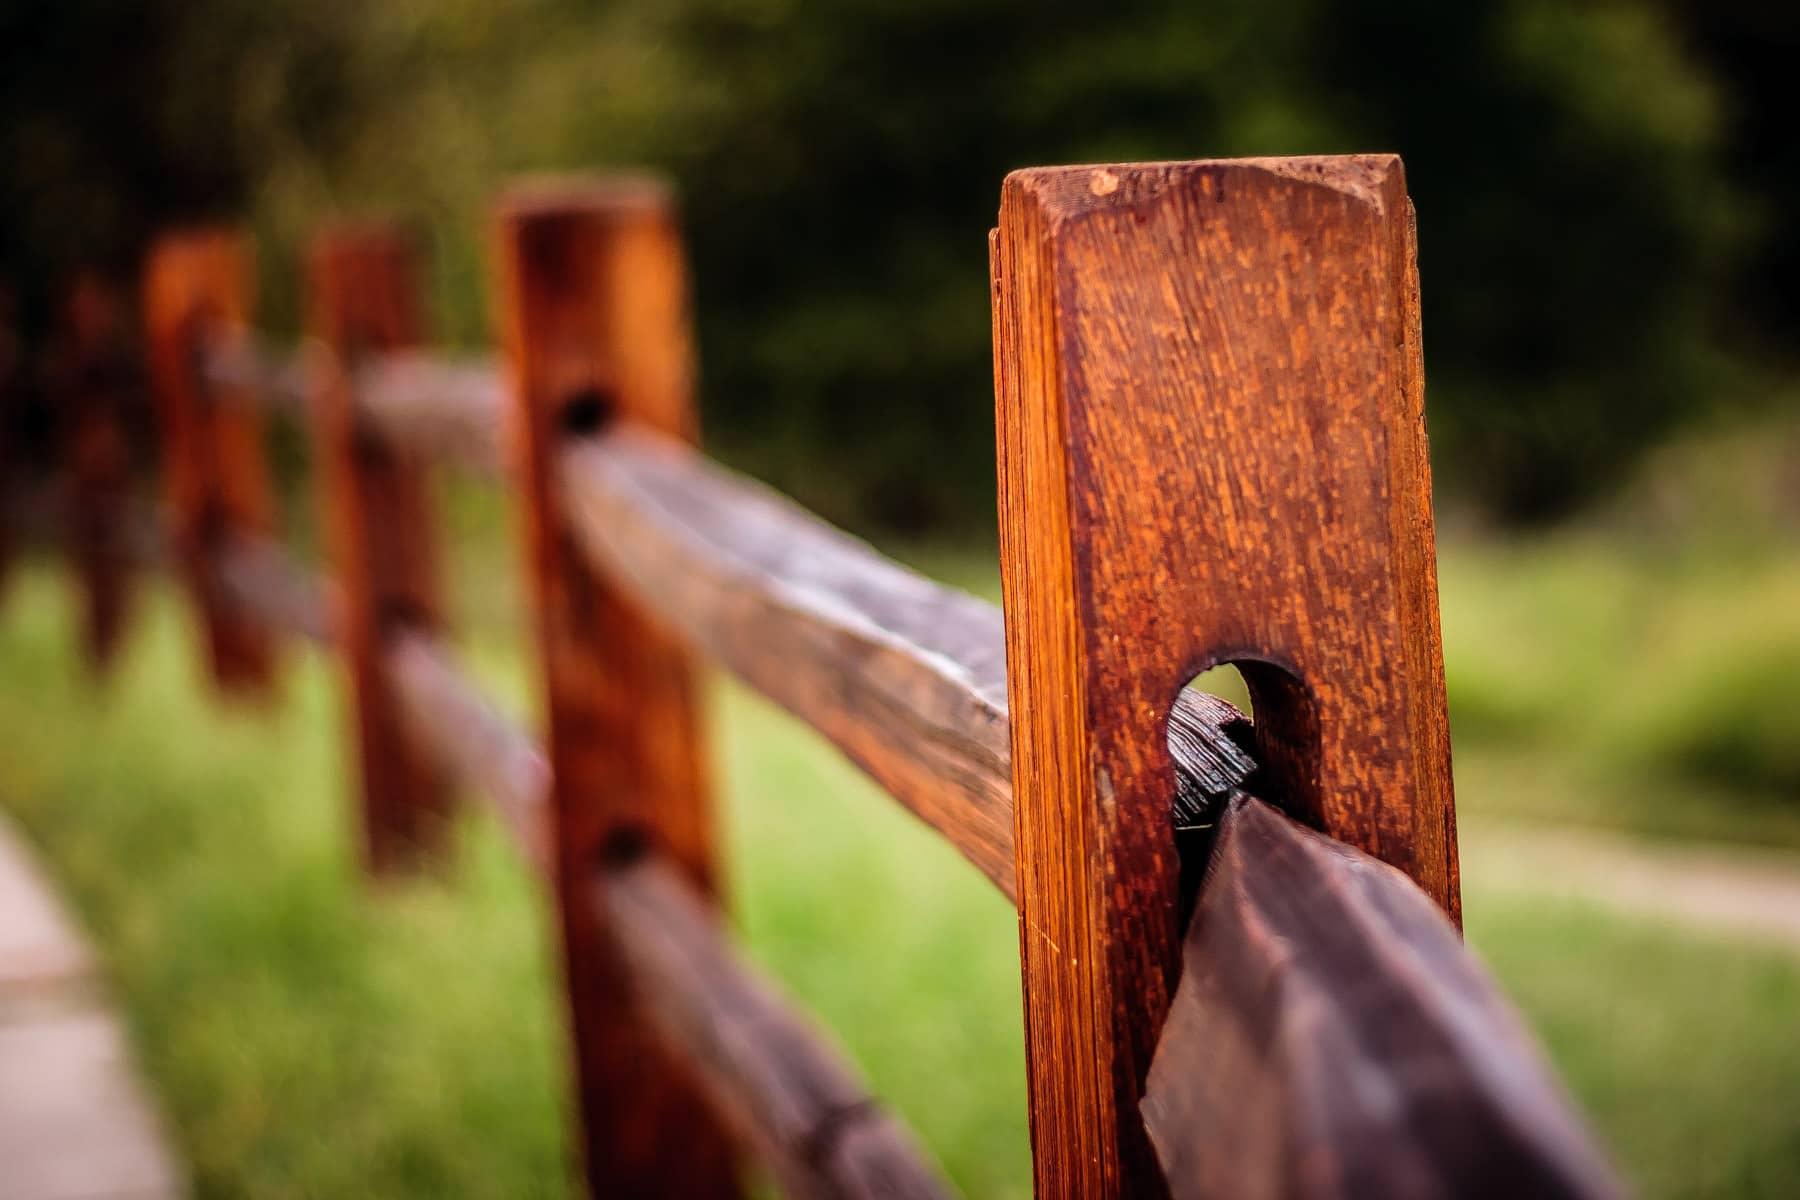 A fence at Arbor Hills Nature Preserve, Plano, Texas.